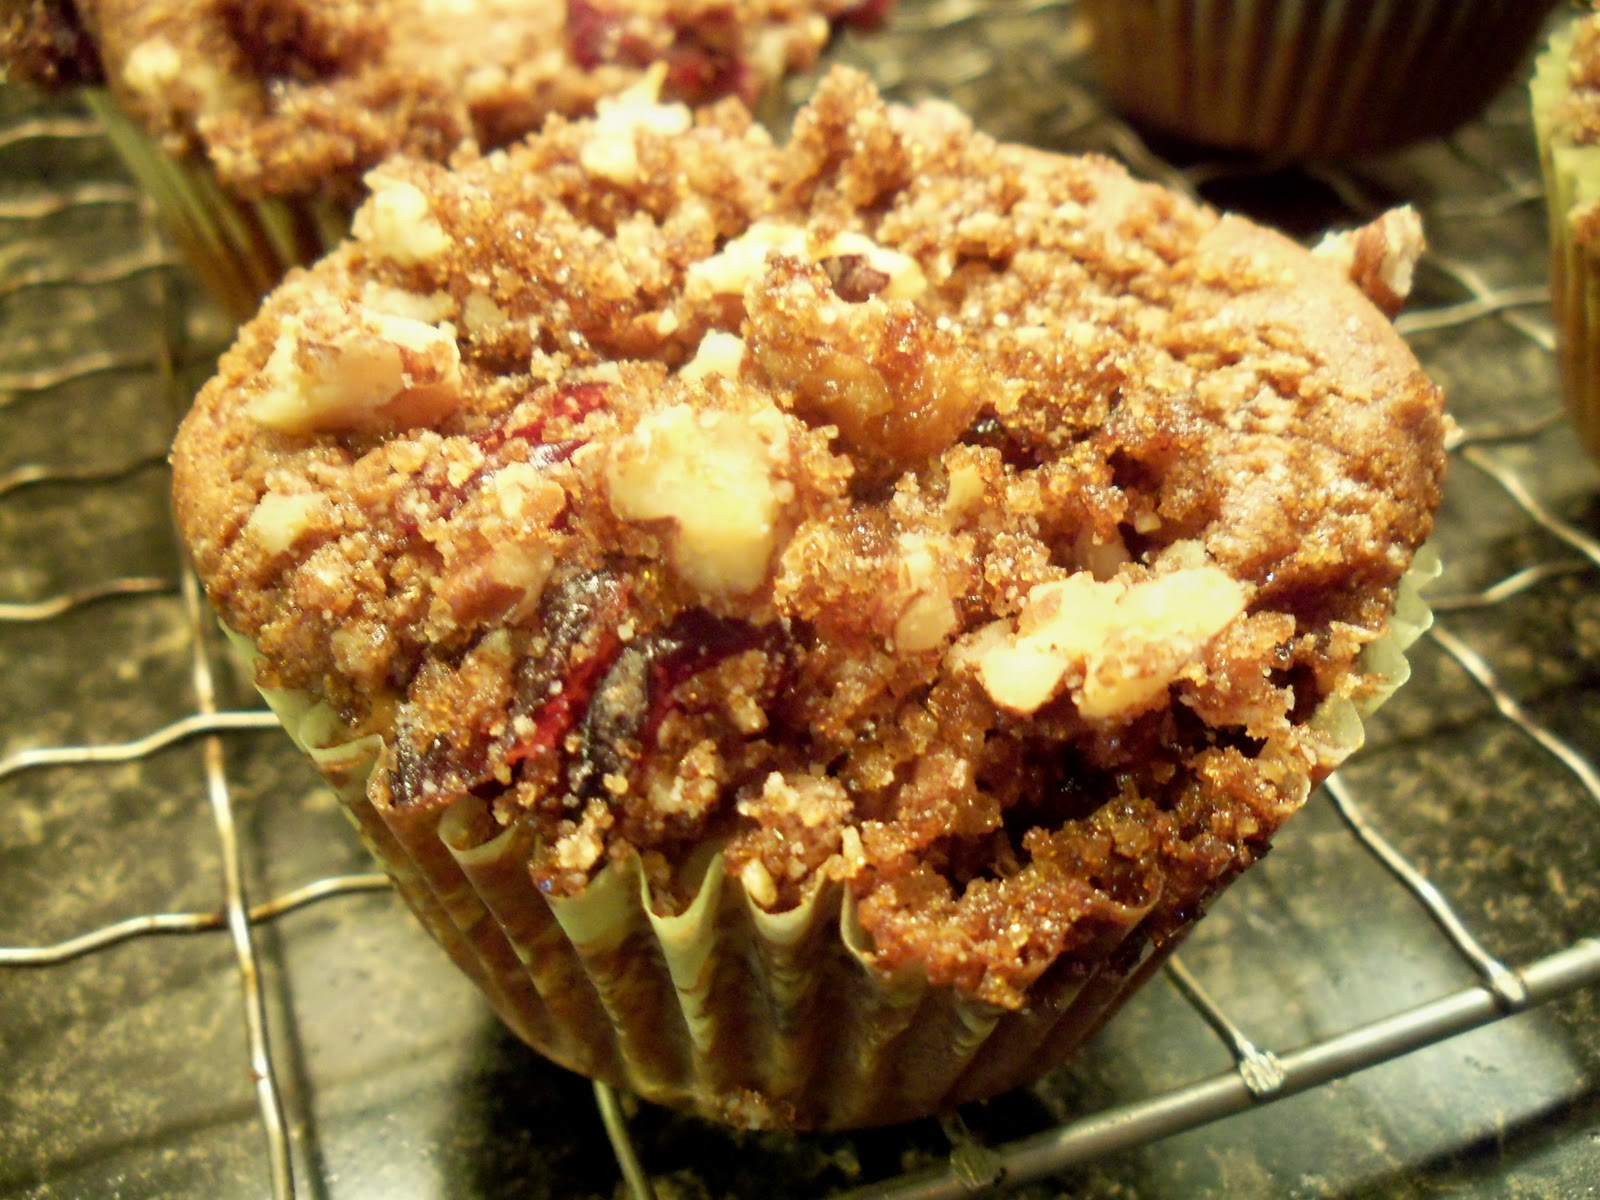 ... traveling vegan chef: GF Pumpkin Muffins with Cranberry Pecan Streusel